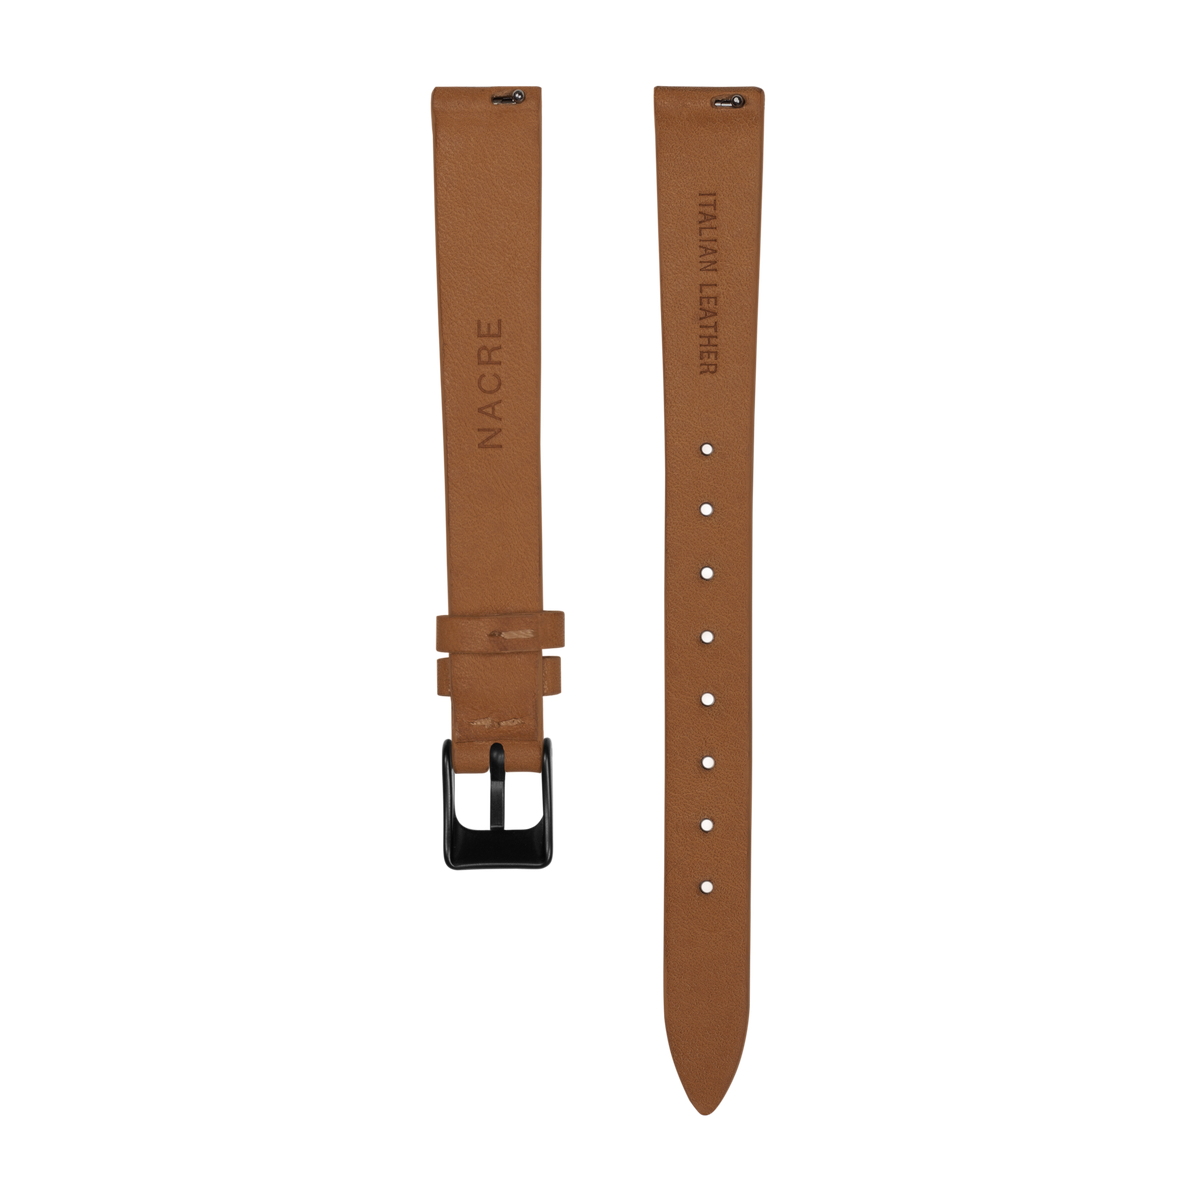 Strap - Italian Leather - Saddle Leather - Matte Black - 12mm